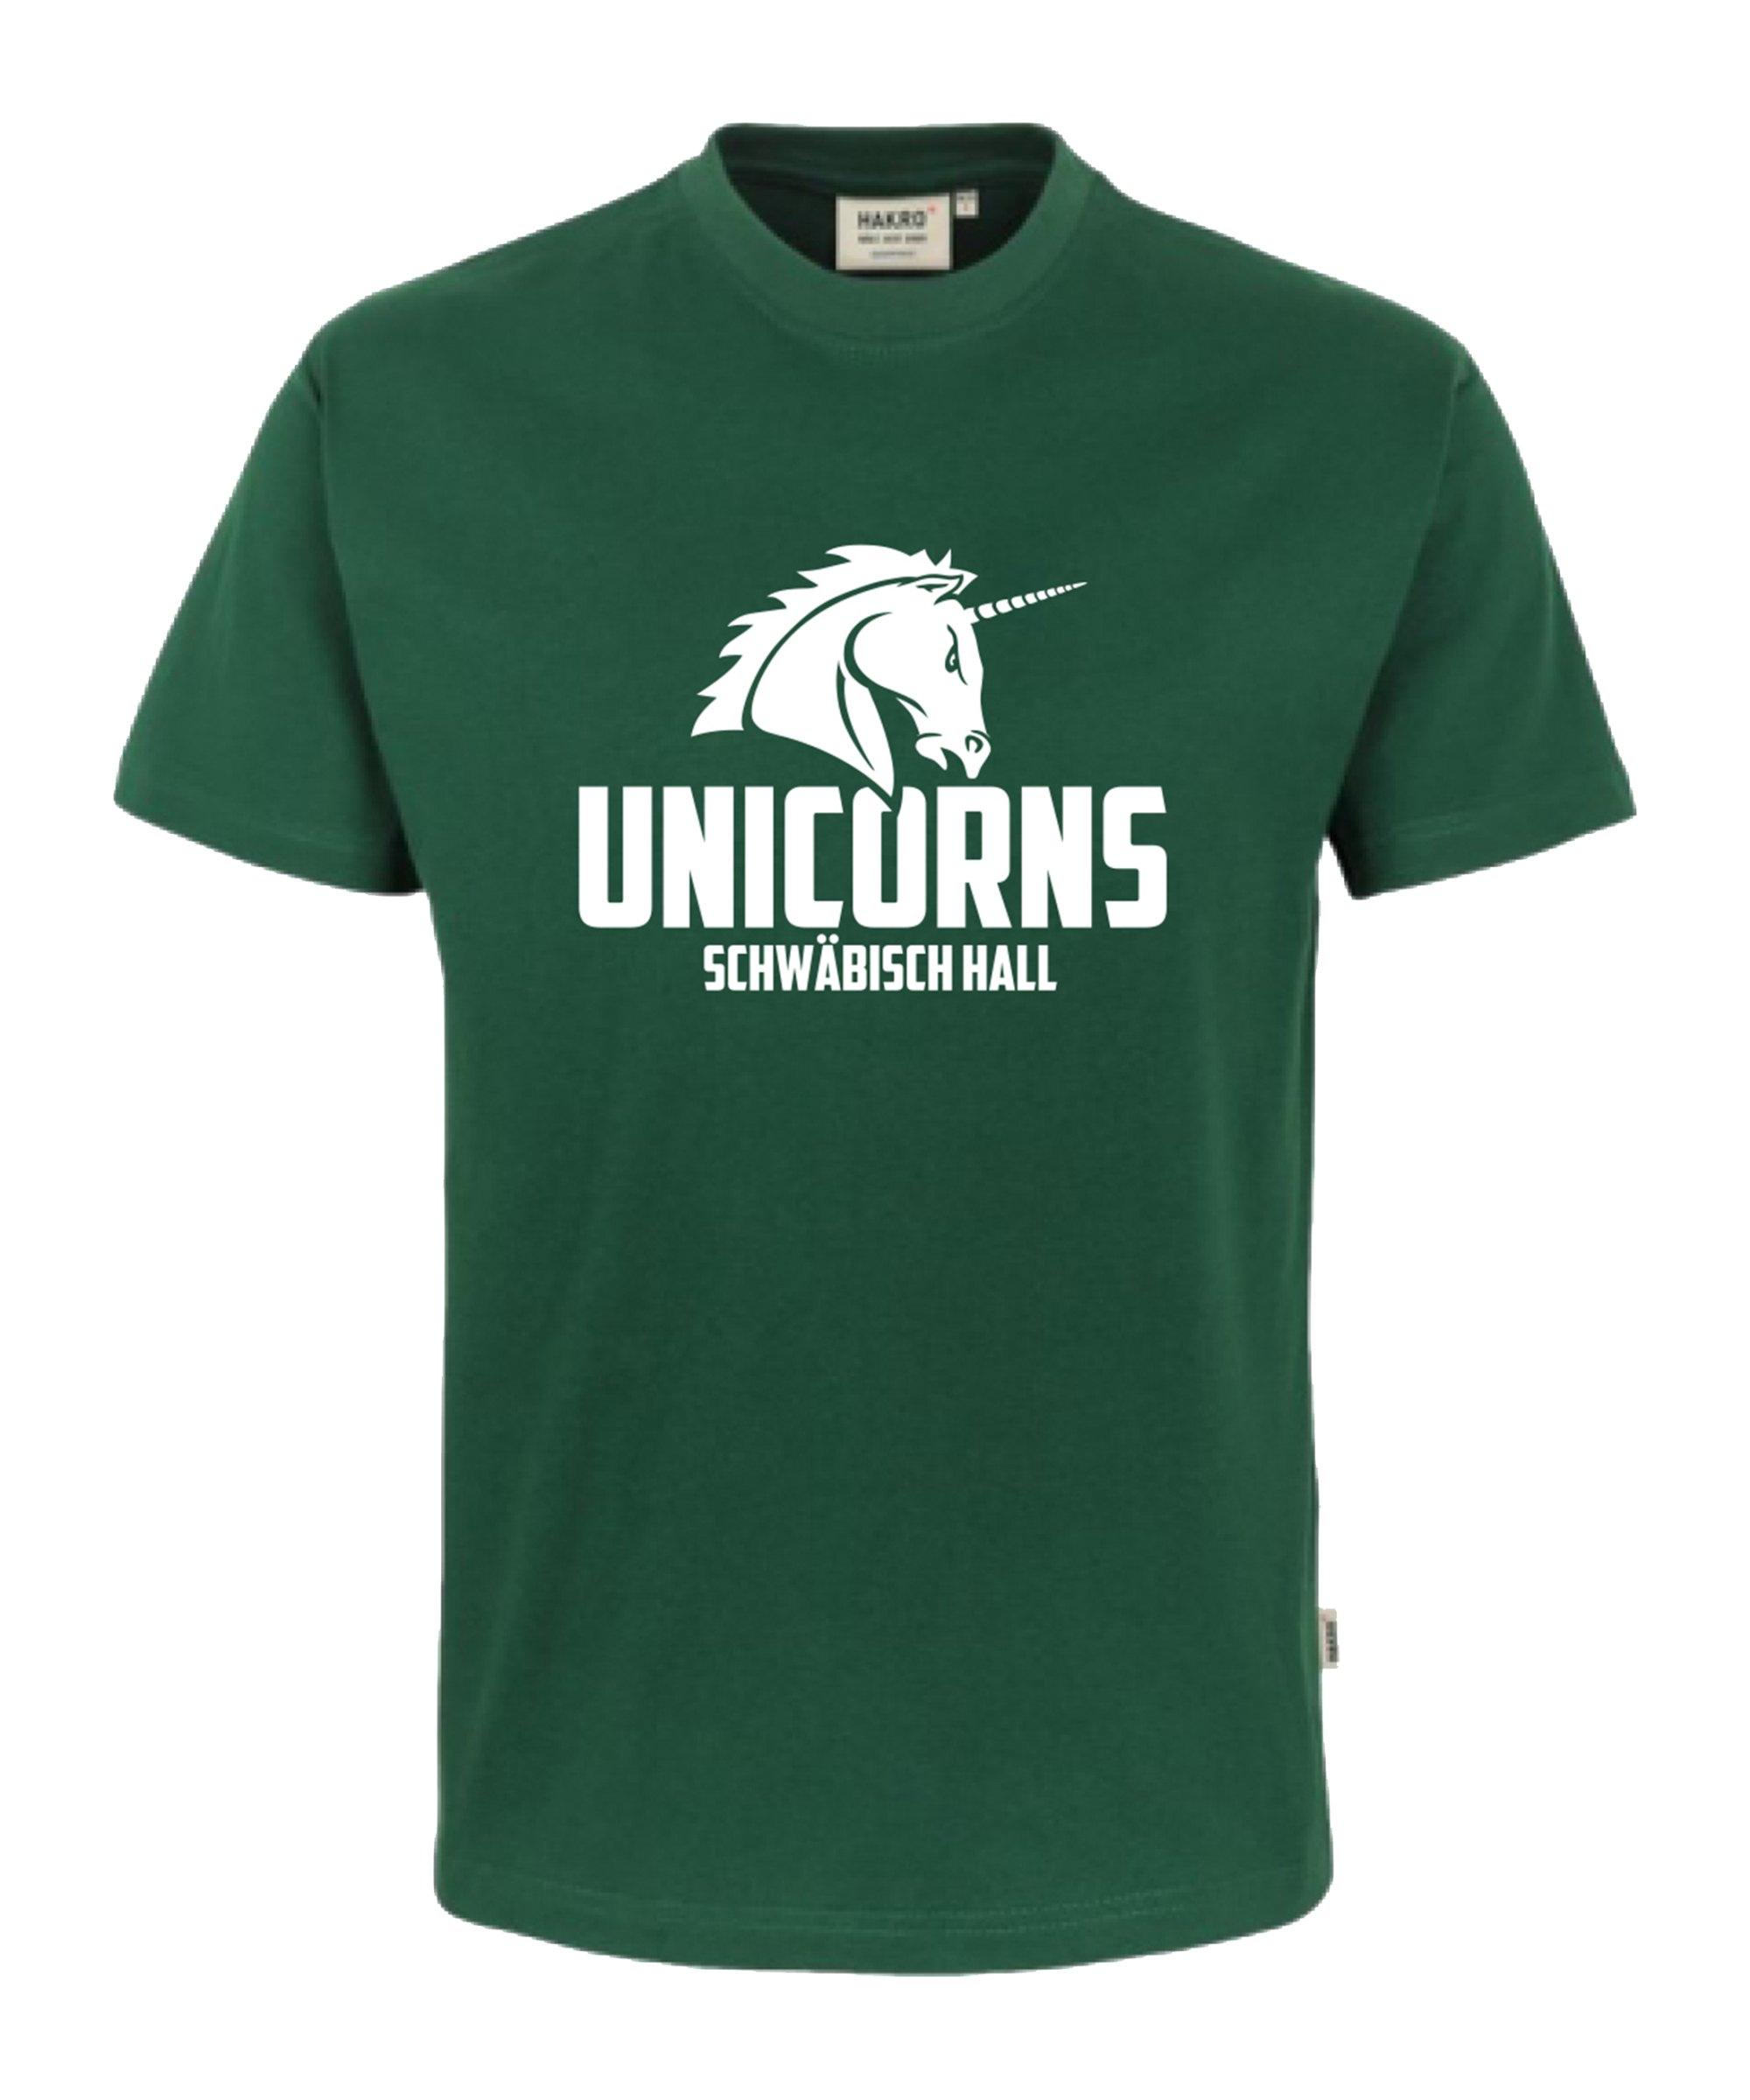 Unicorns Classic T-Shirt Tee Unicorn groß Grün - gruen